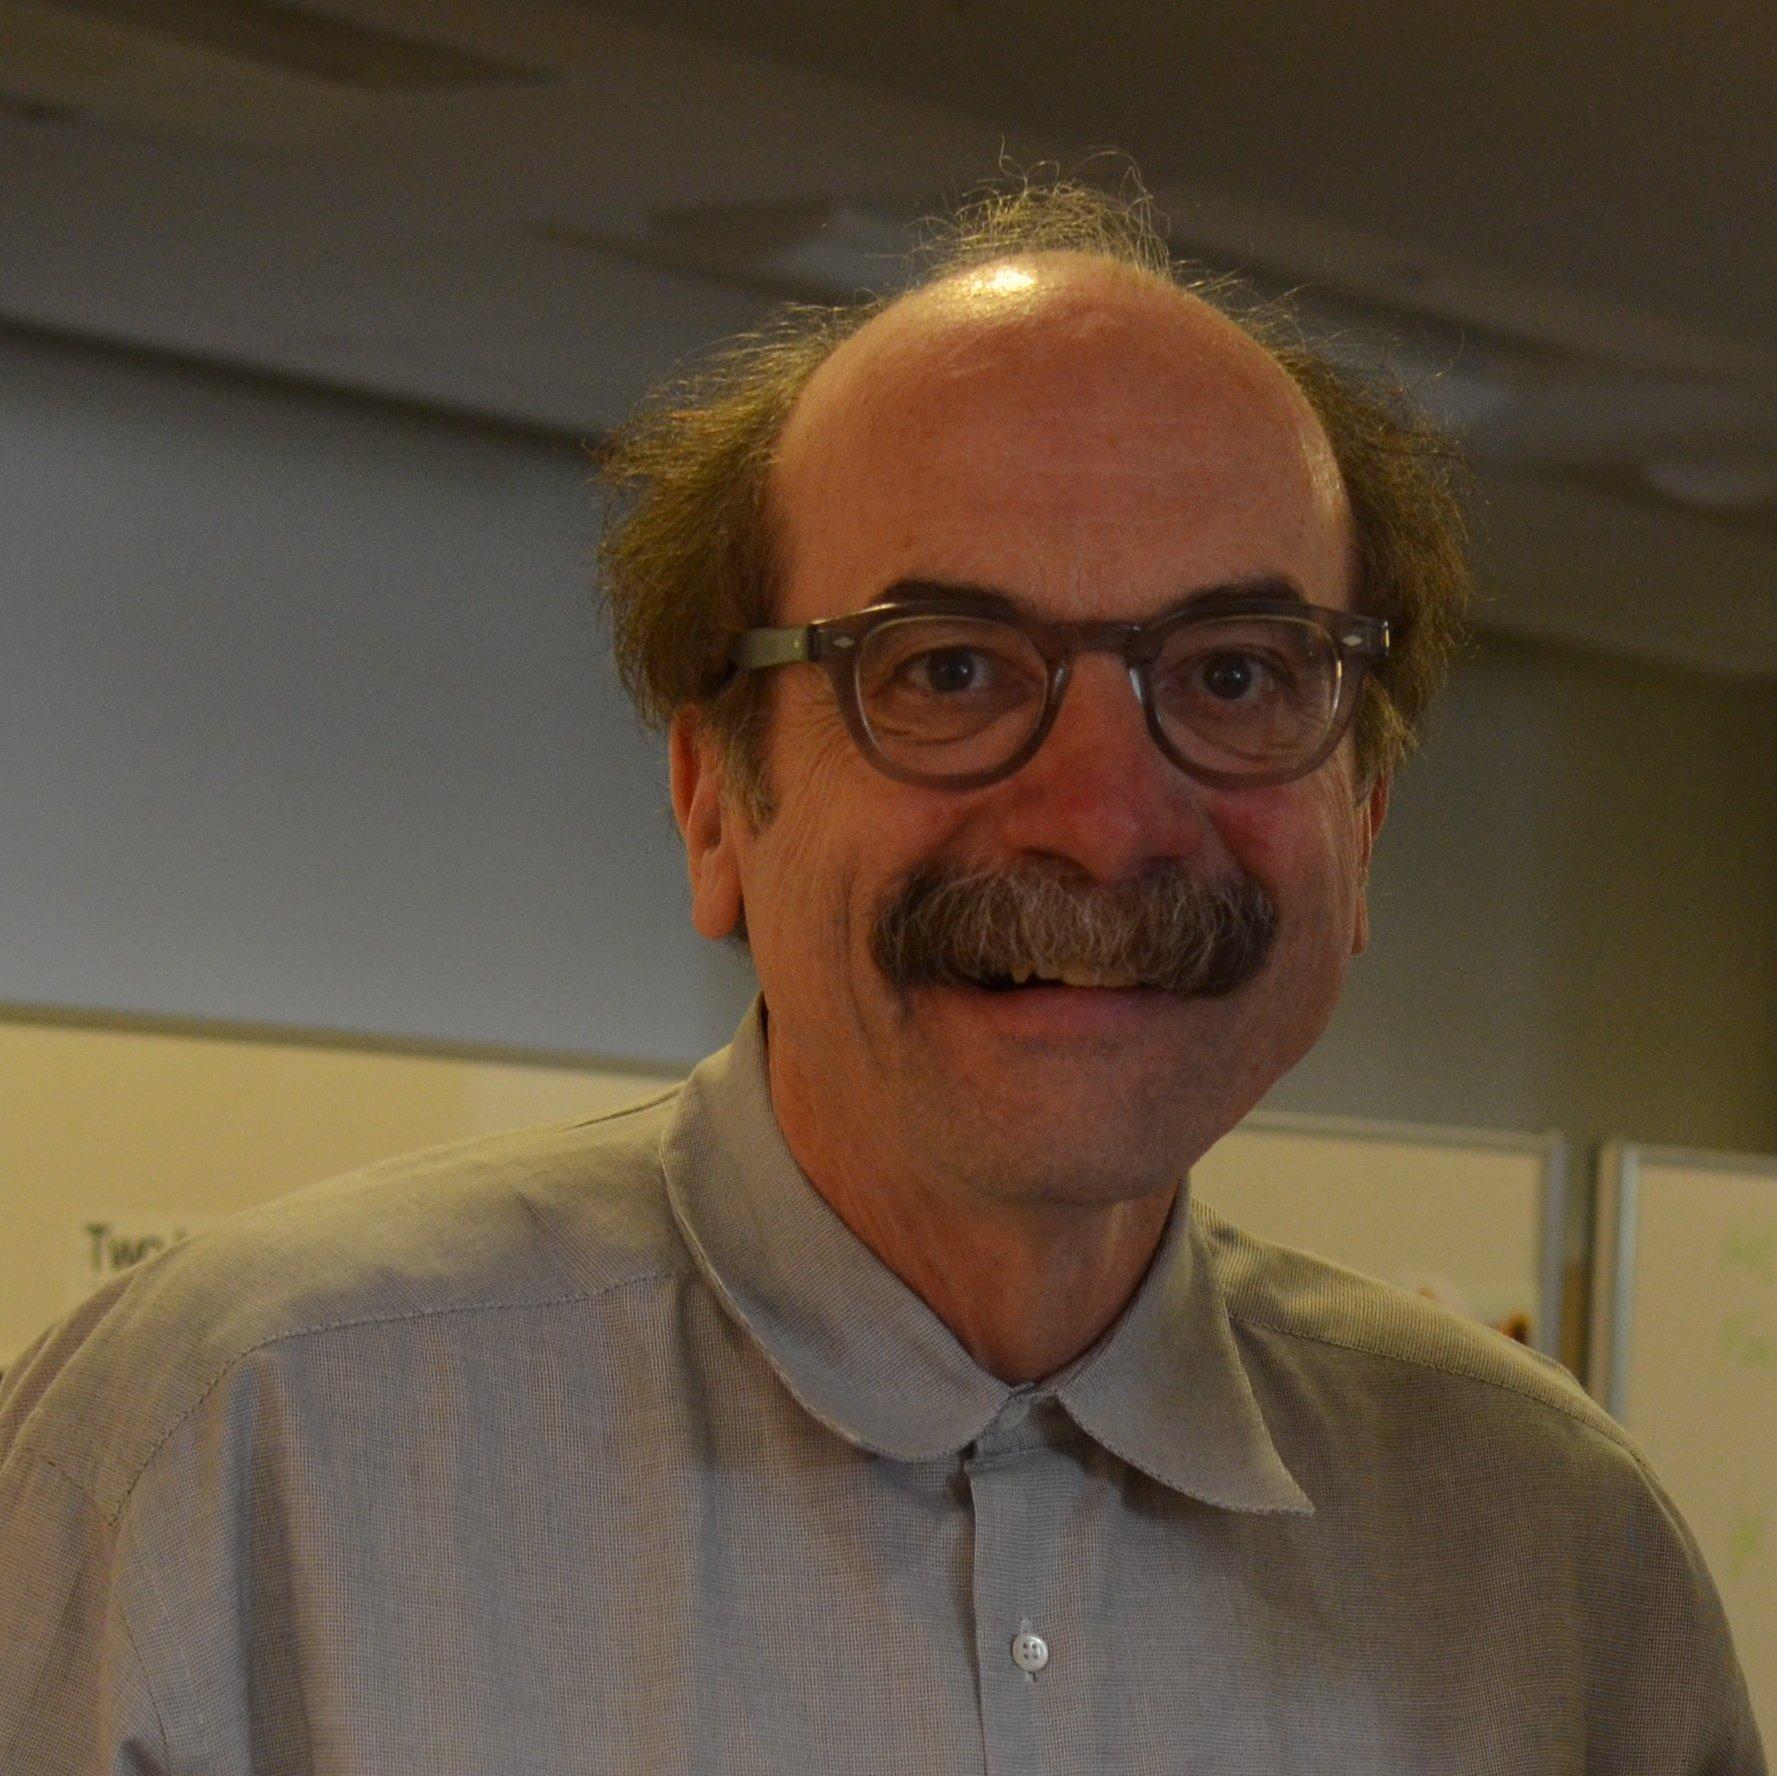 David Kelley, founder of IDEO